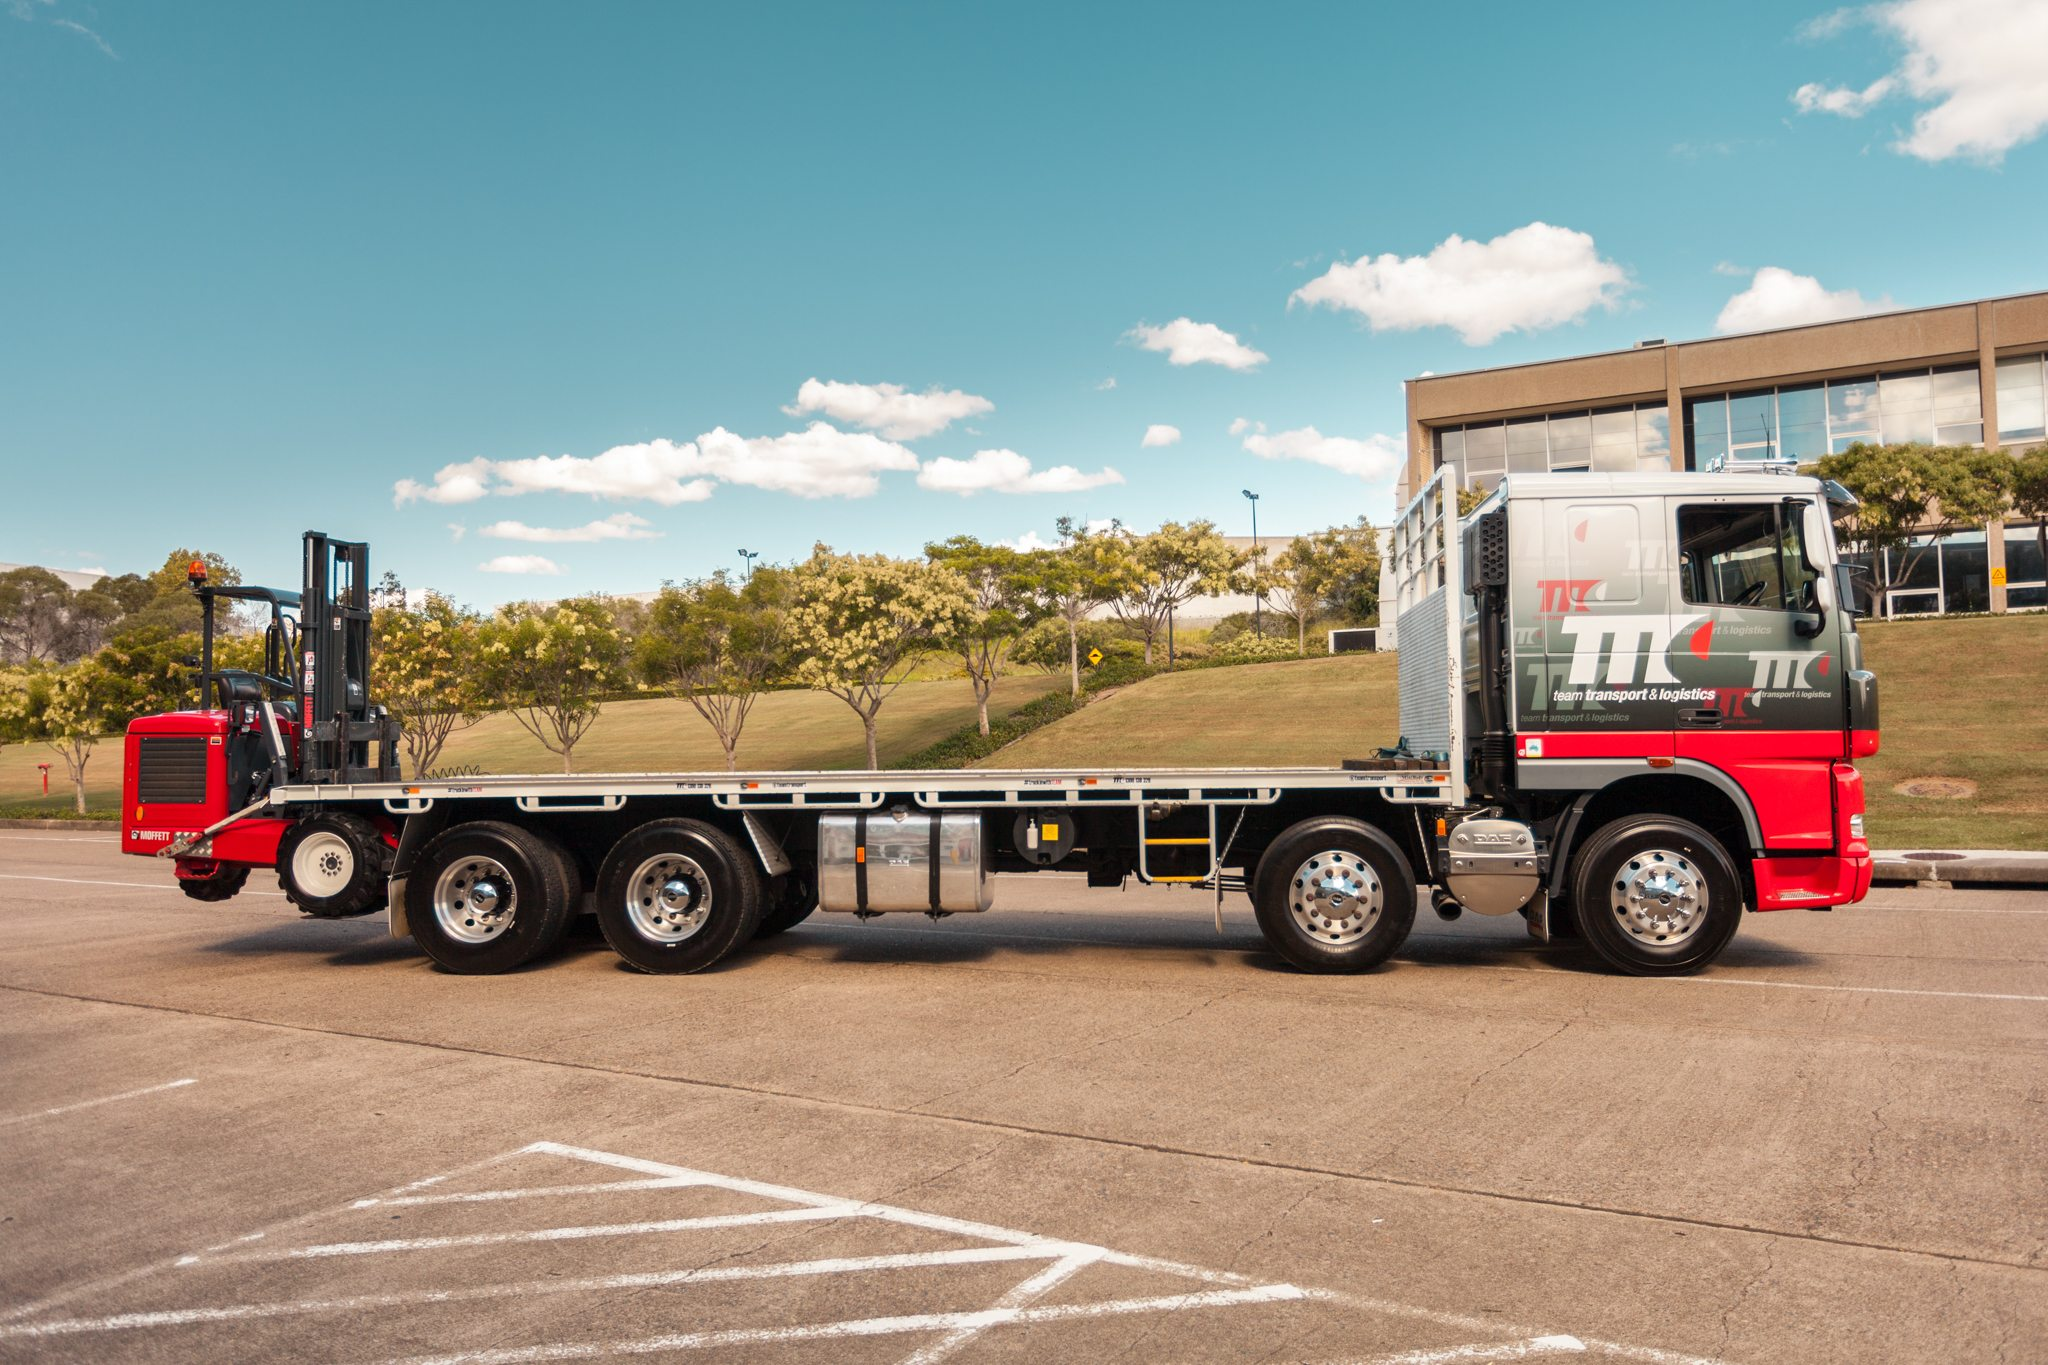 Budget Car And Truck Rental Cheltenham